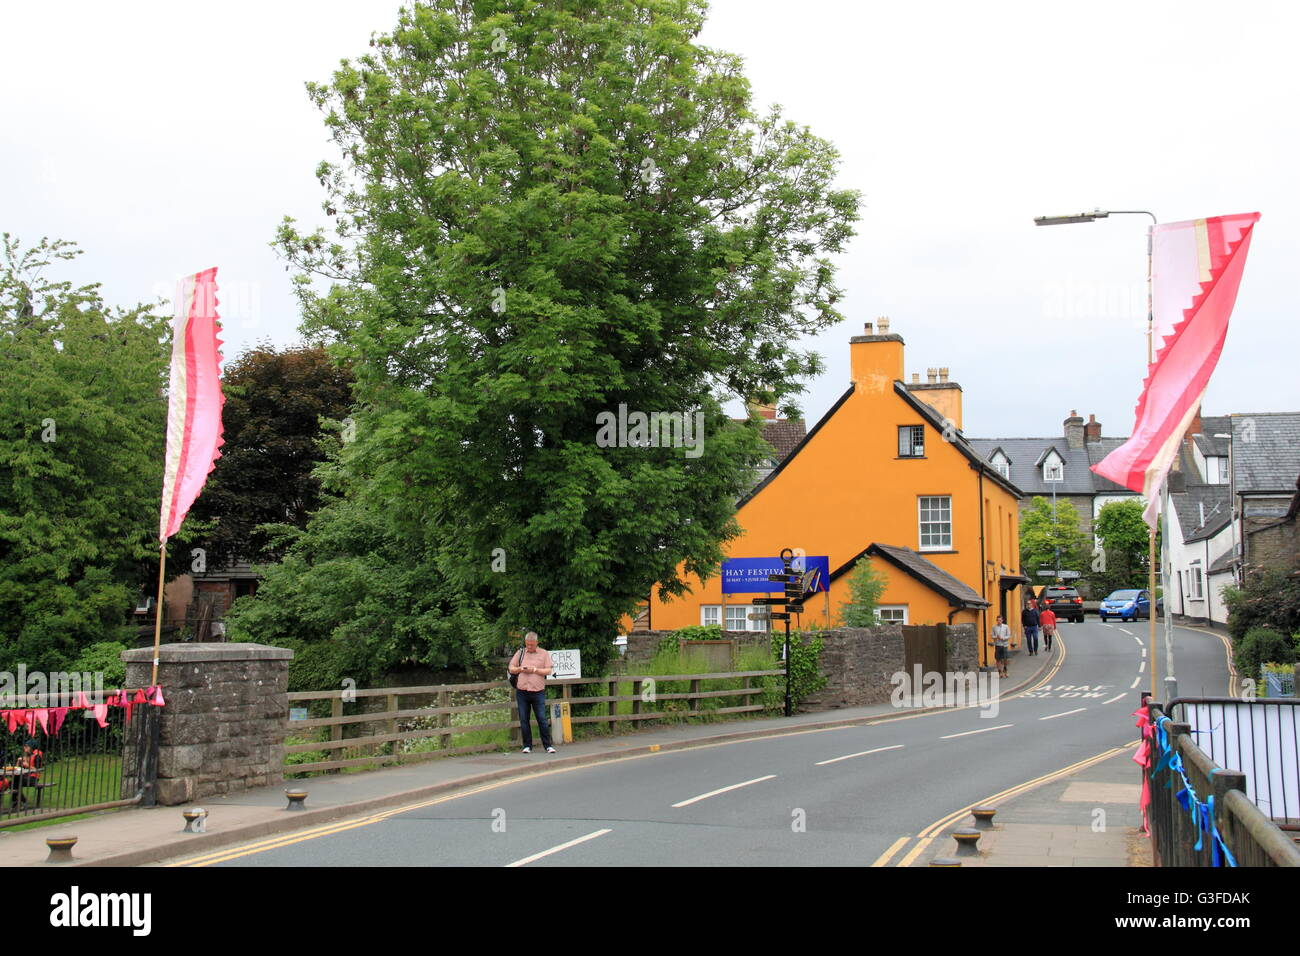 Bridge Street, Hay-on-Wye, Powys, Wales, Great Britain, United Kingdom, UK, Europe - Stock Image